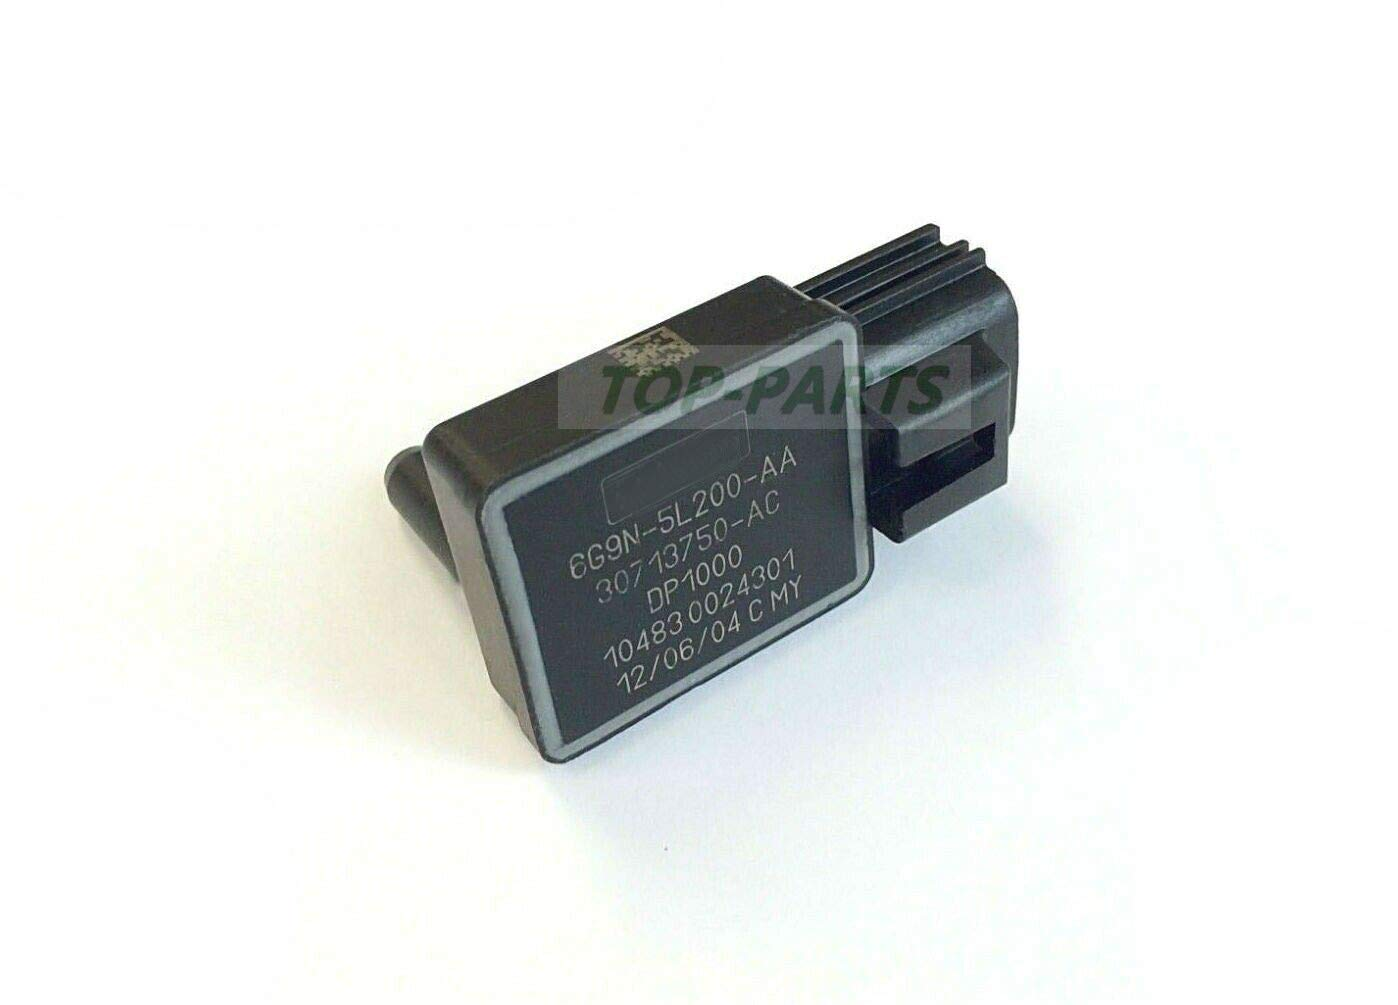 Sensor DPF de presi/ón diferente 6G9N-5L200-AA LR023134 C2Z6459